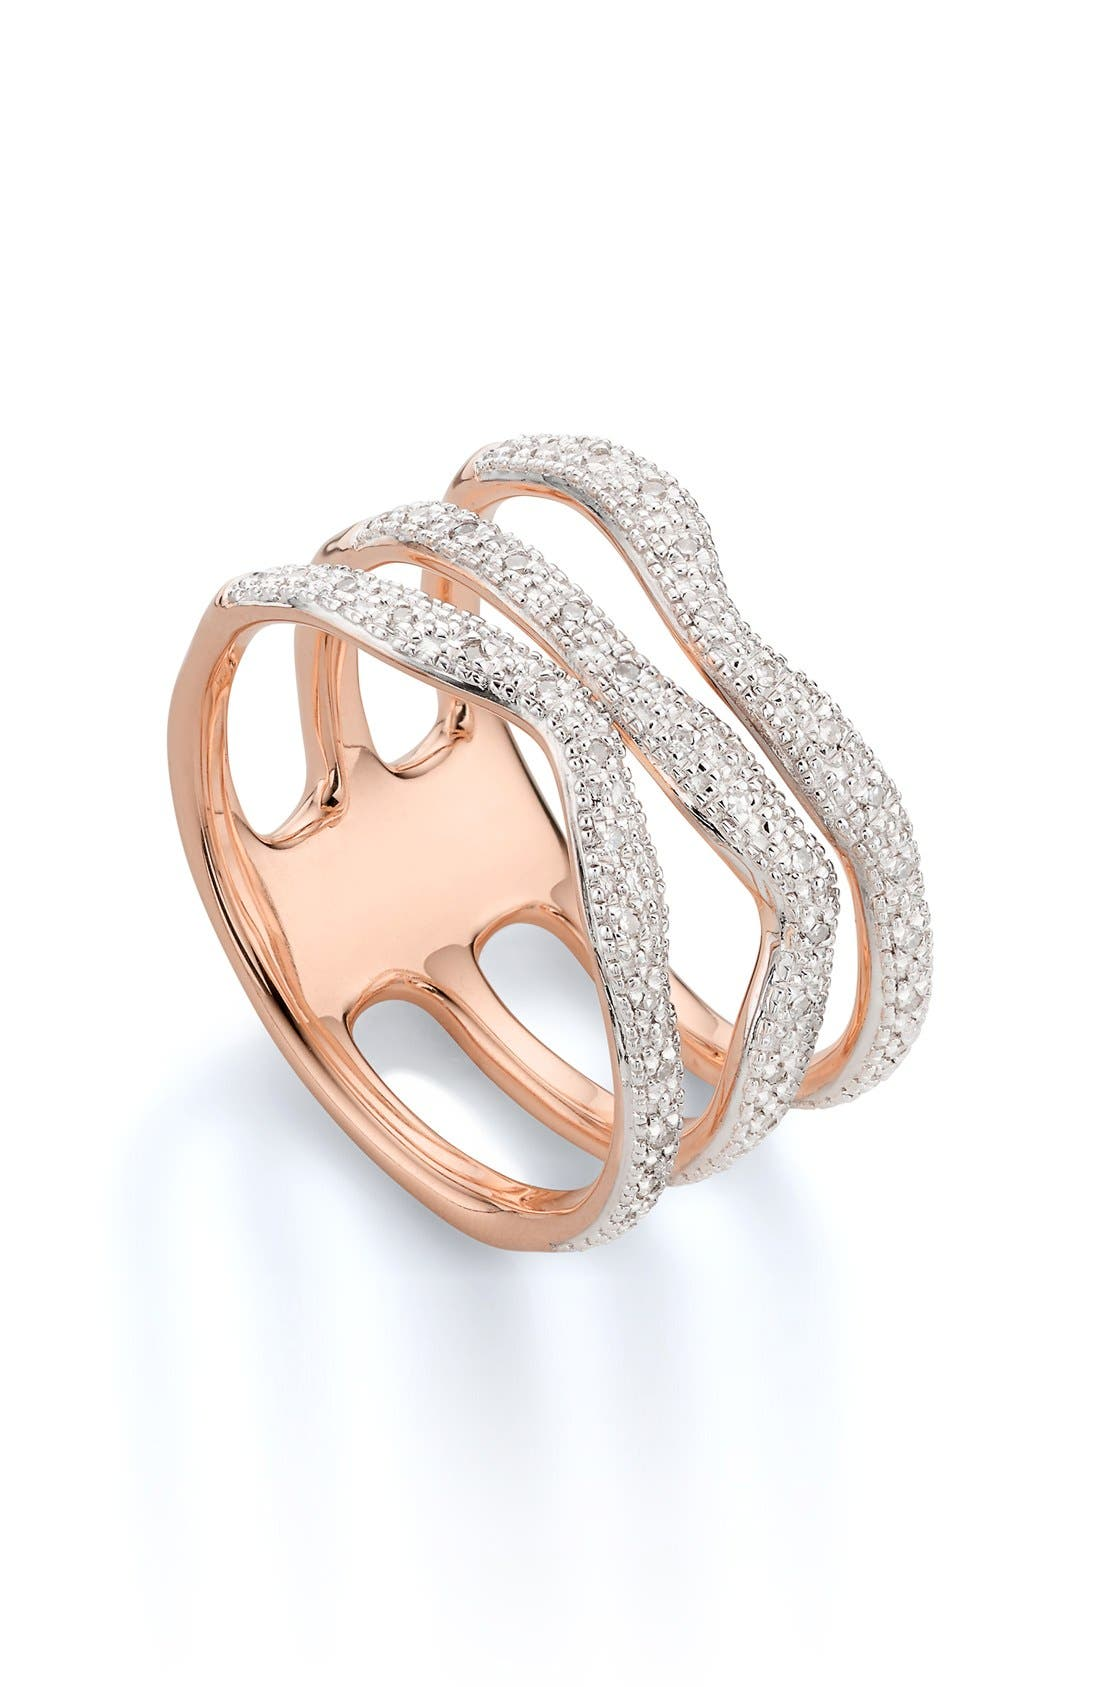 Monica Vinader 'Riva' Three Band Diamond Ring